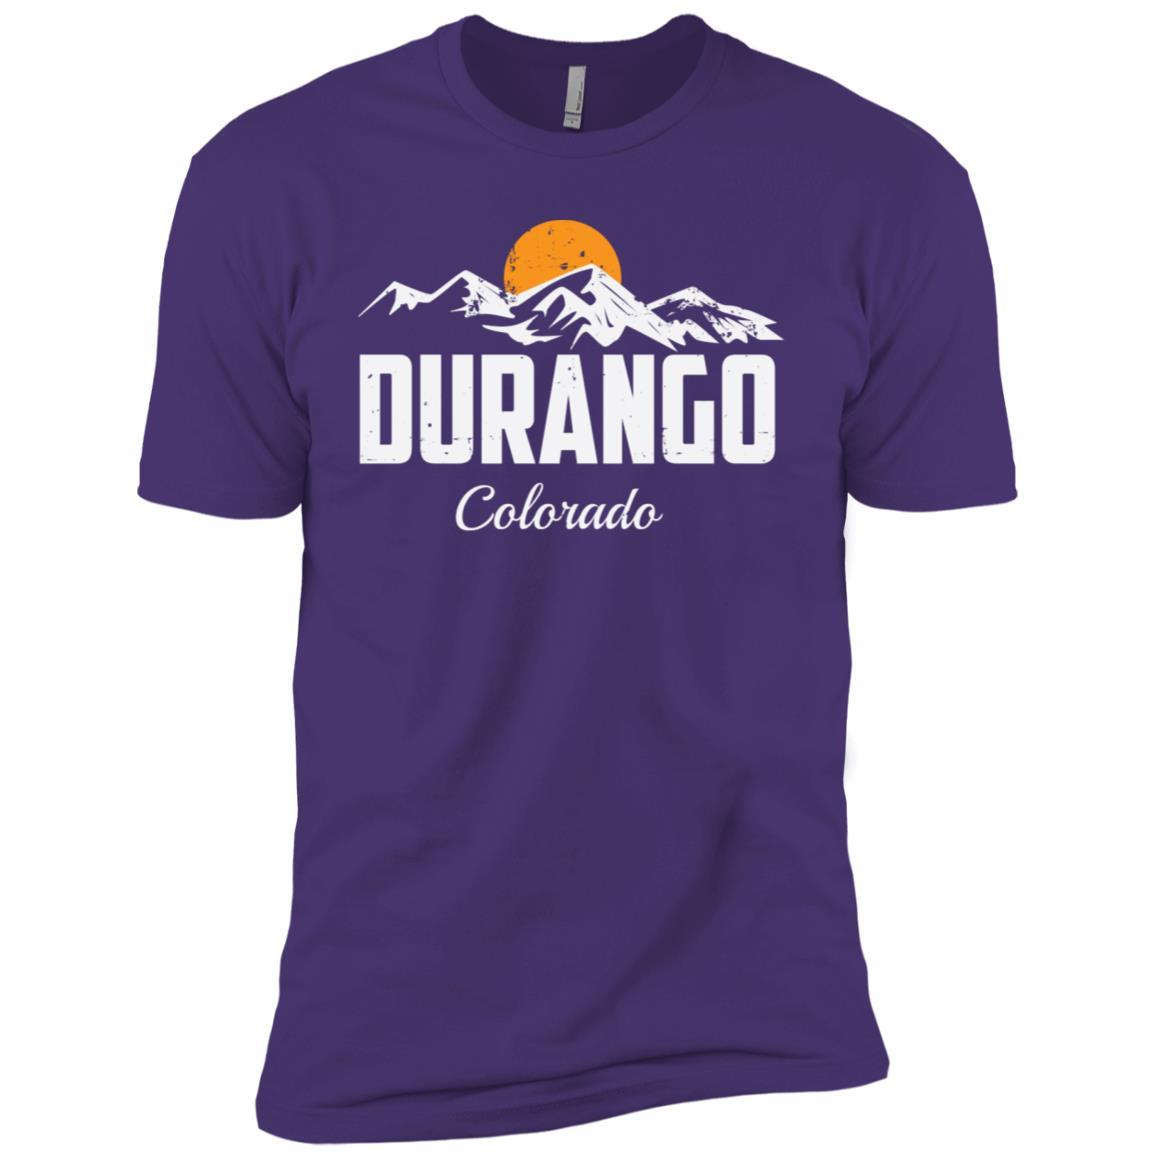 Durango Colorado Mountain Hiking Men Short Sleeve T-Shirt